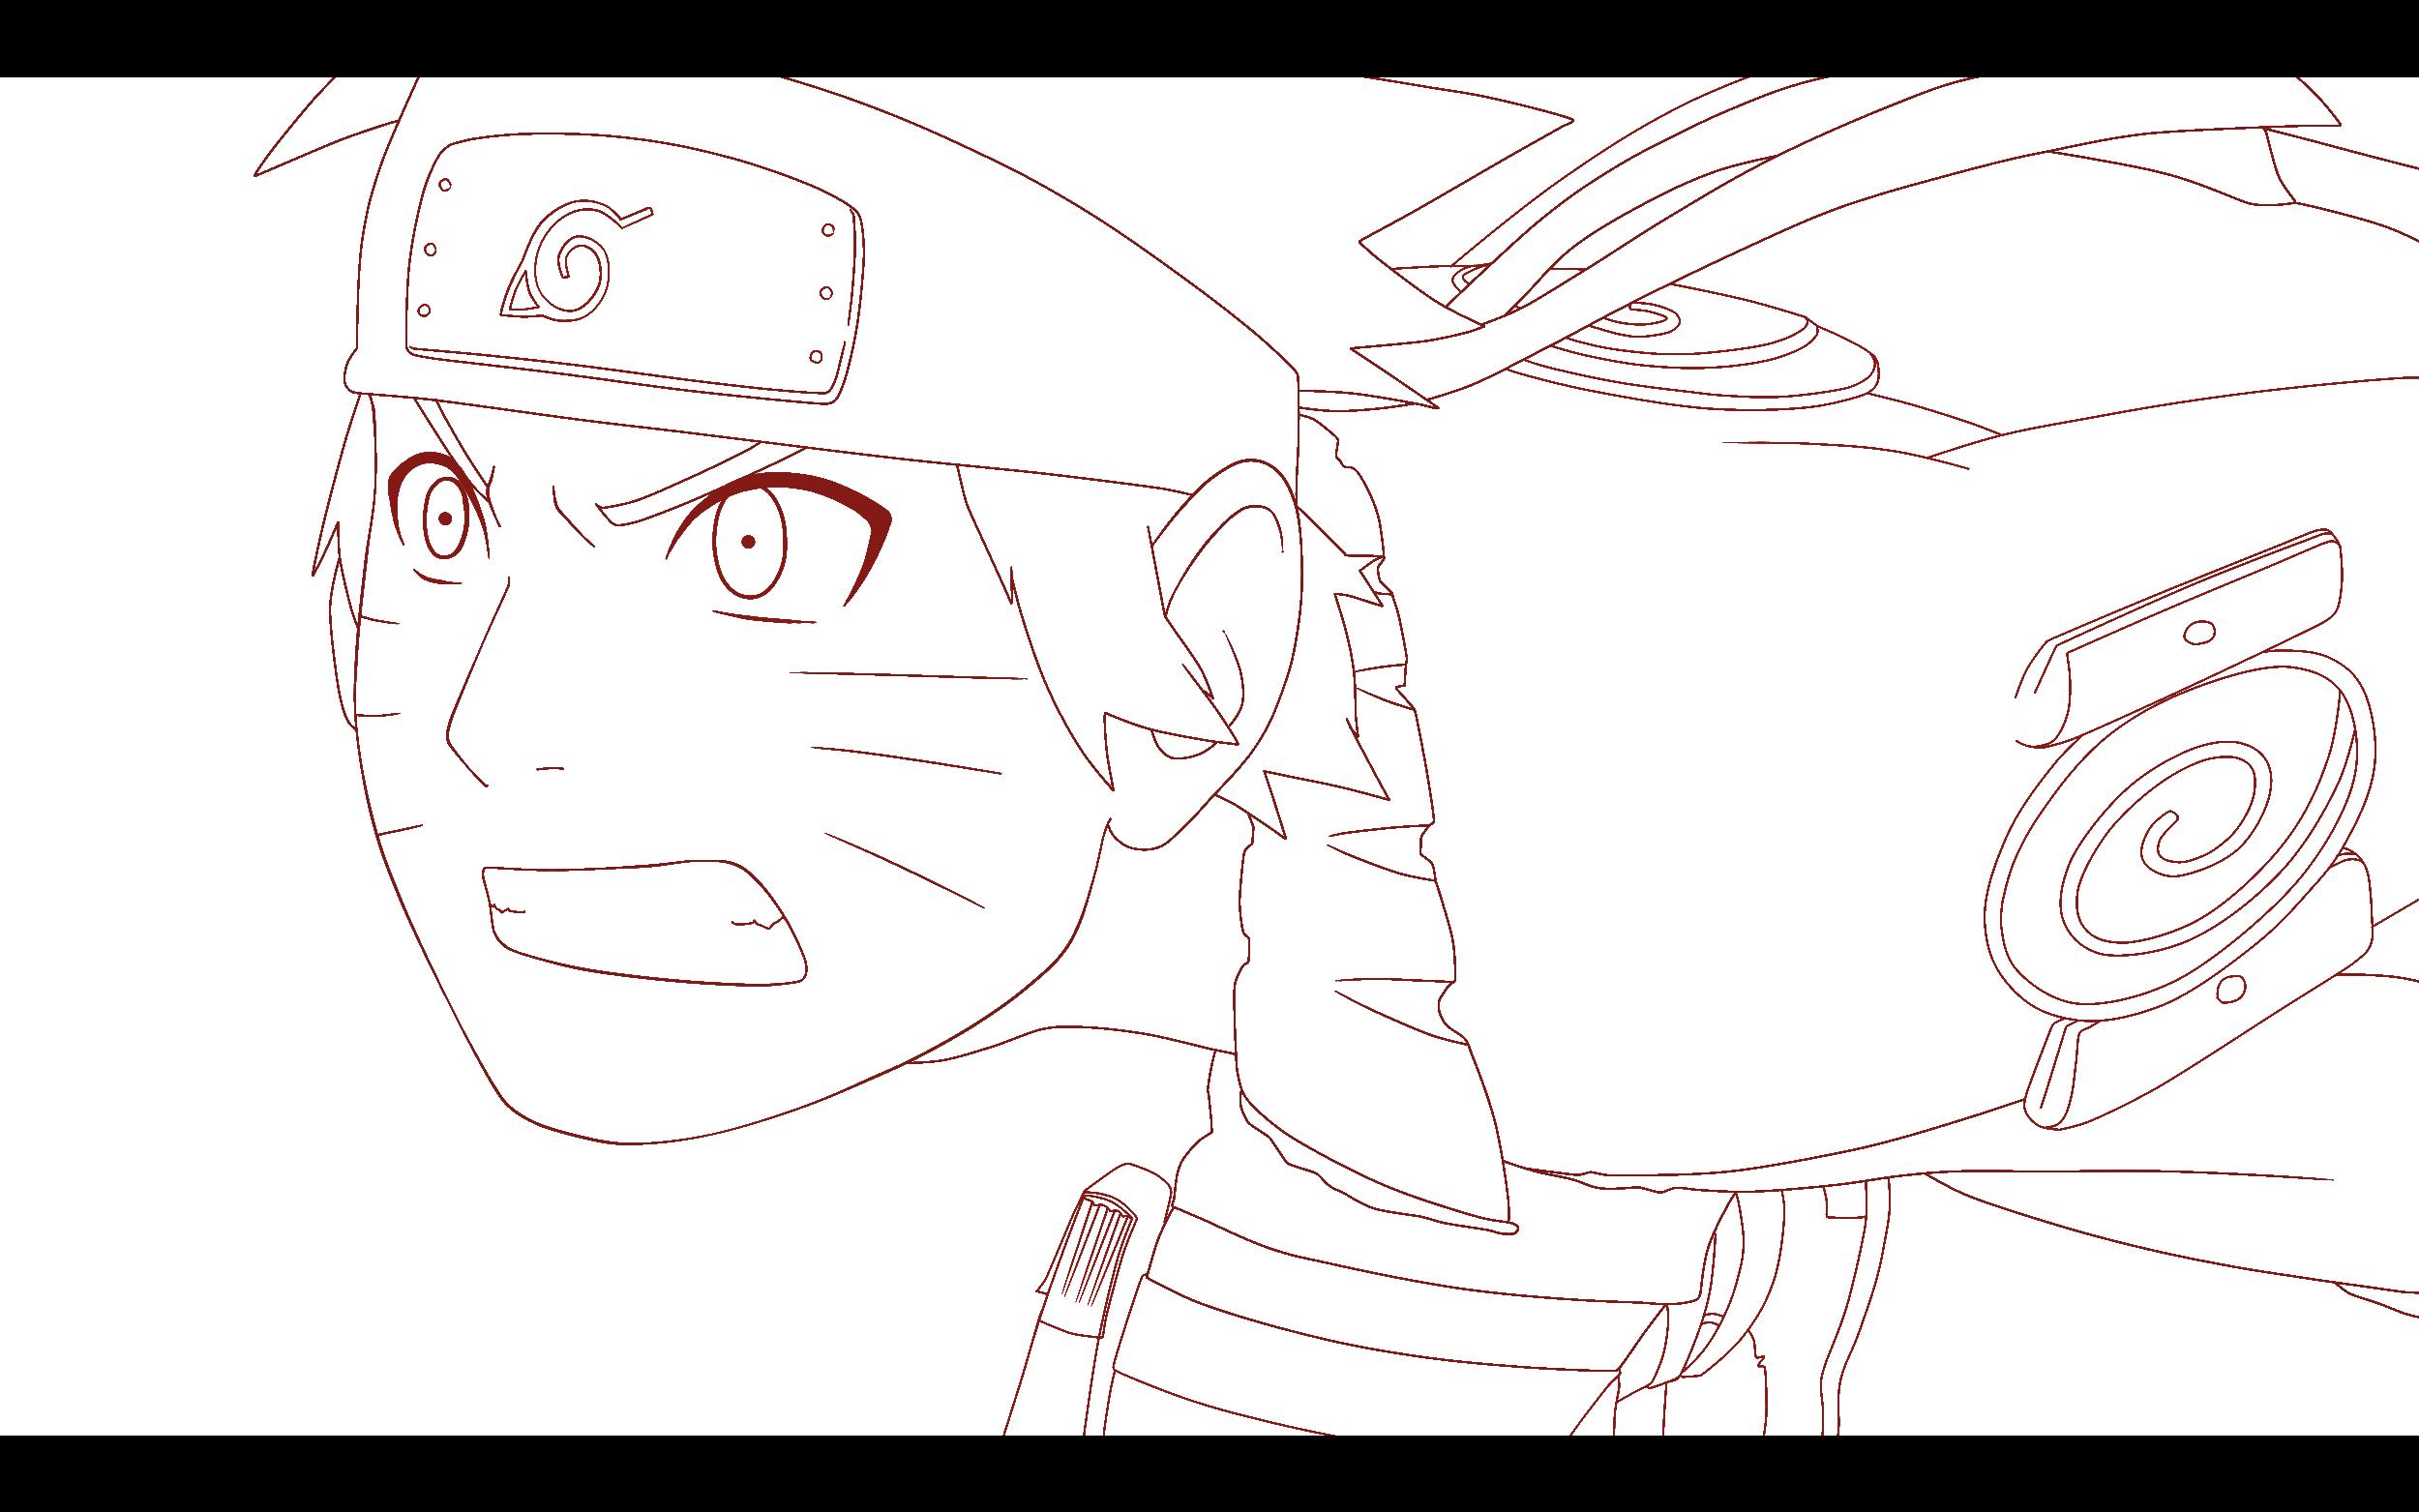 Naruto Shippuden Lineart : Lineart naruto shippuden shikara by carl tos on deviantart